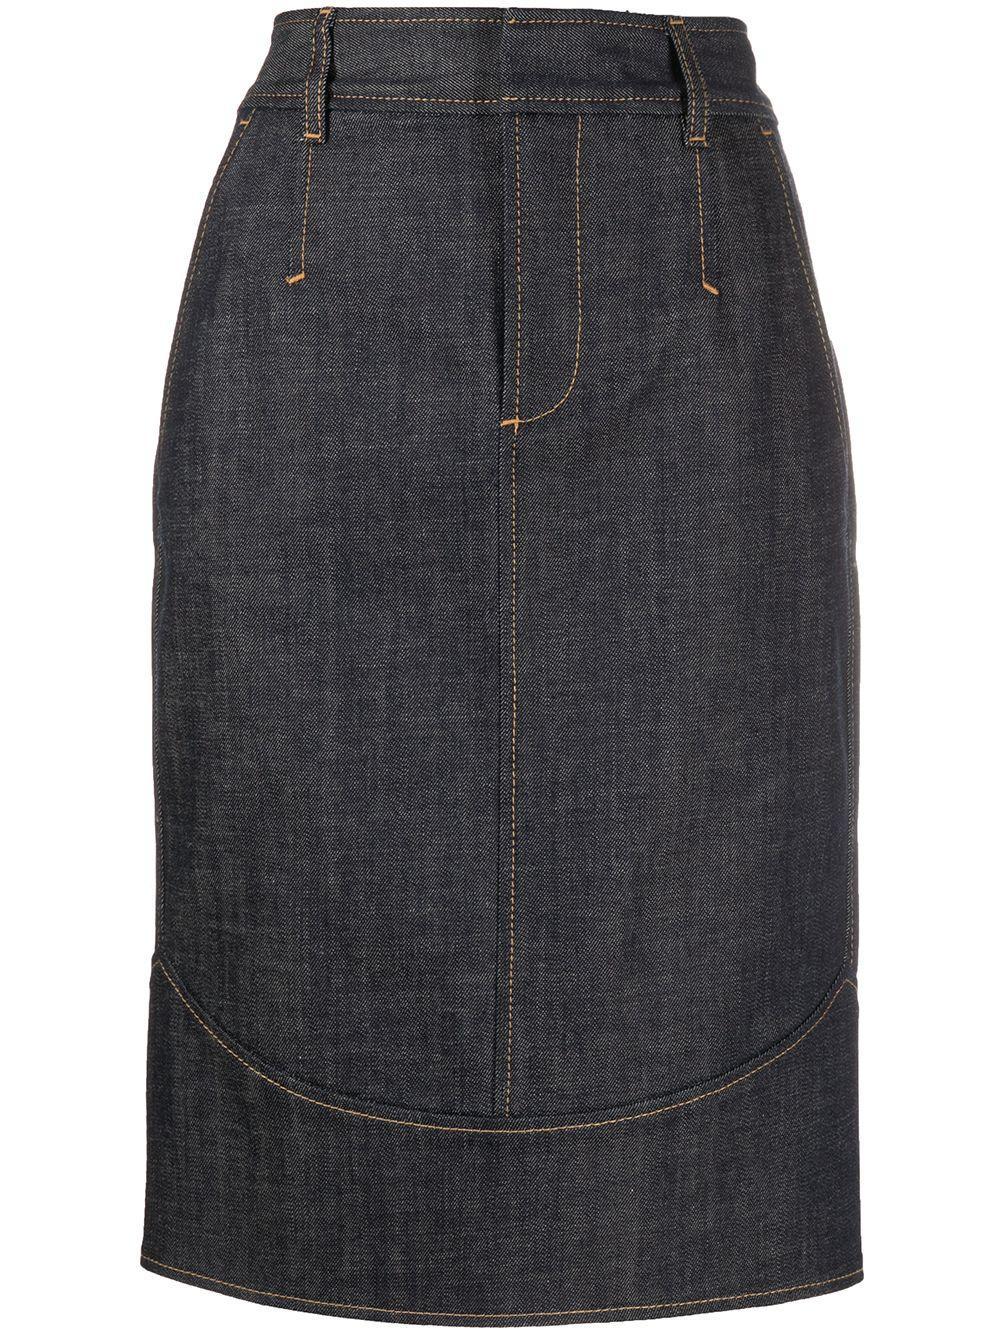 Dsquared2 юбка-карандаш прямого кроя